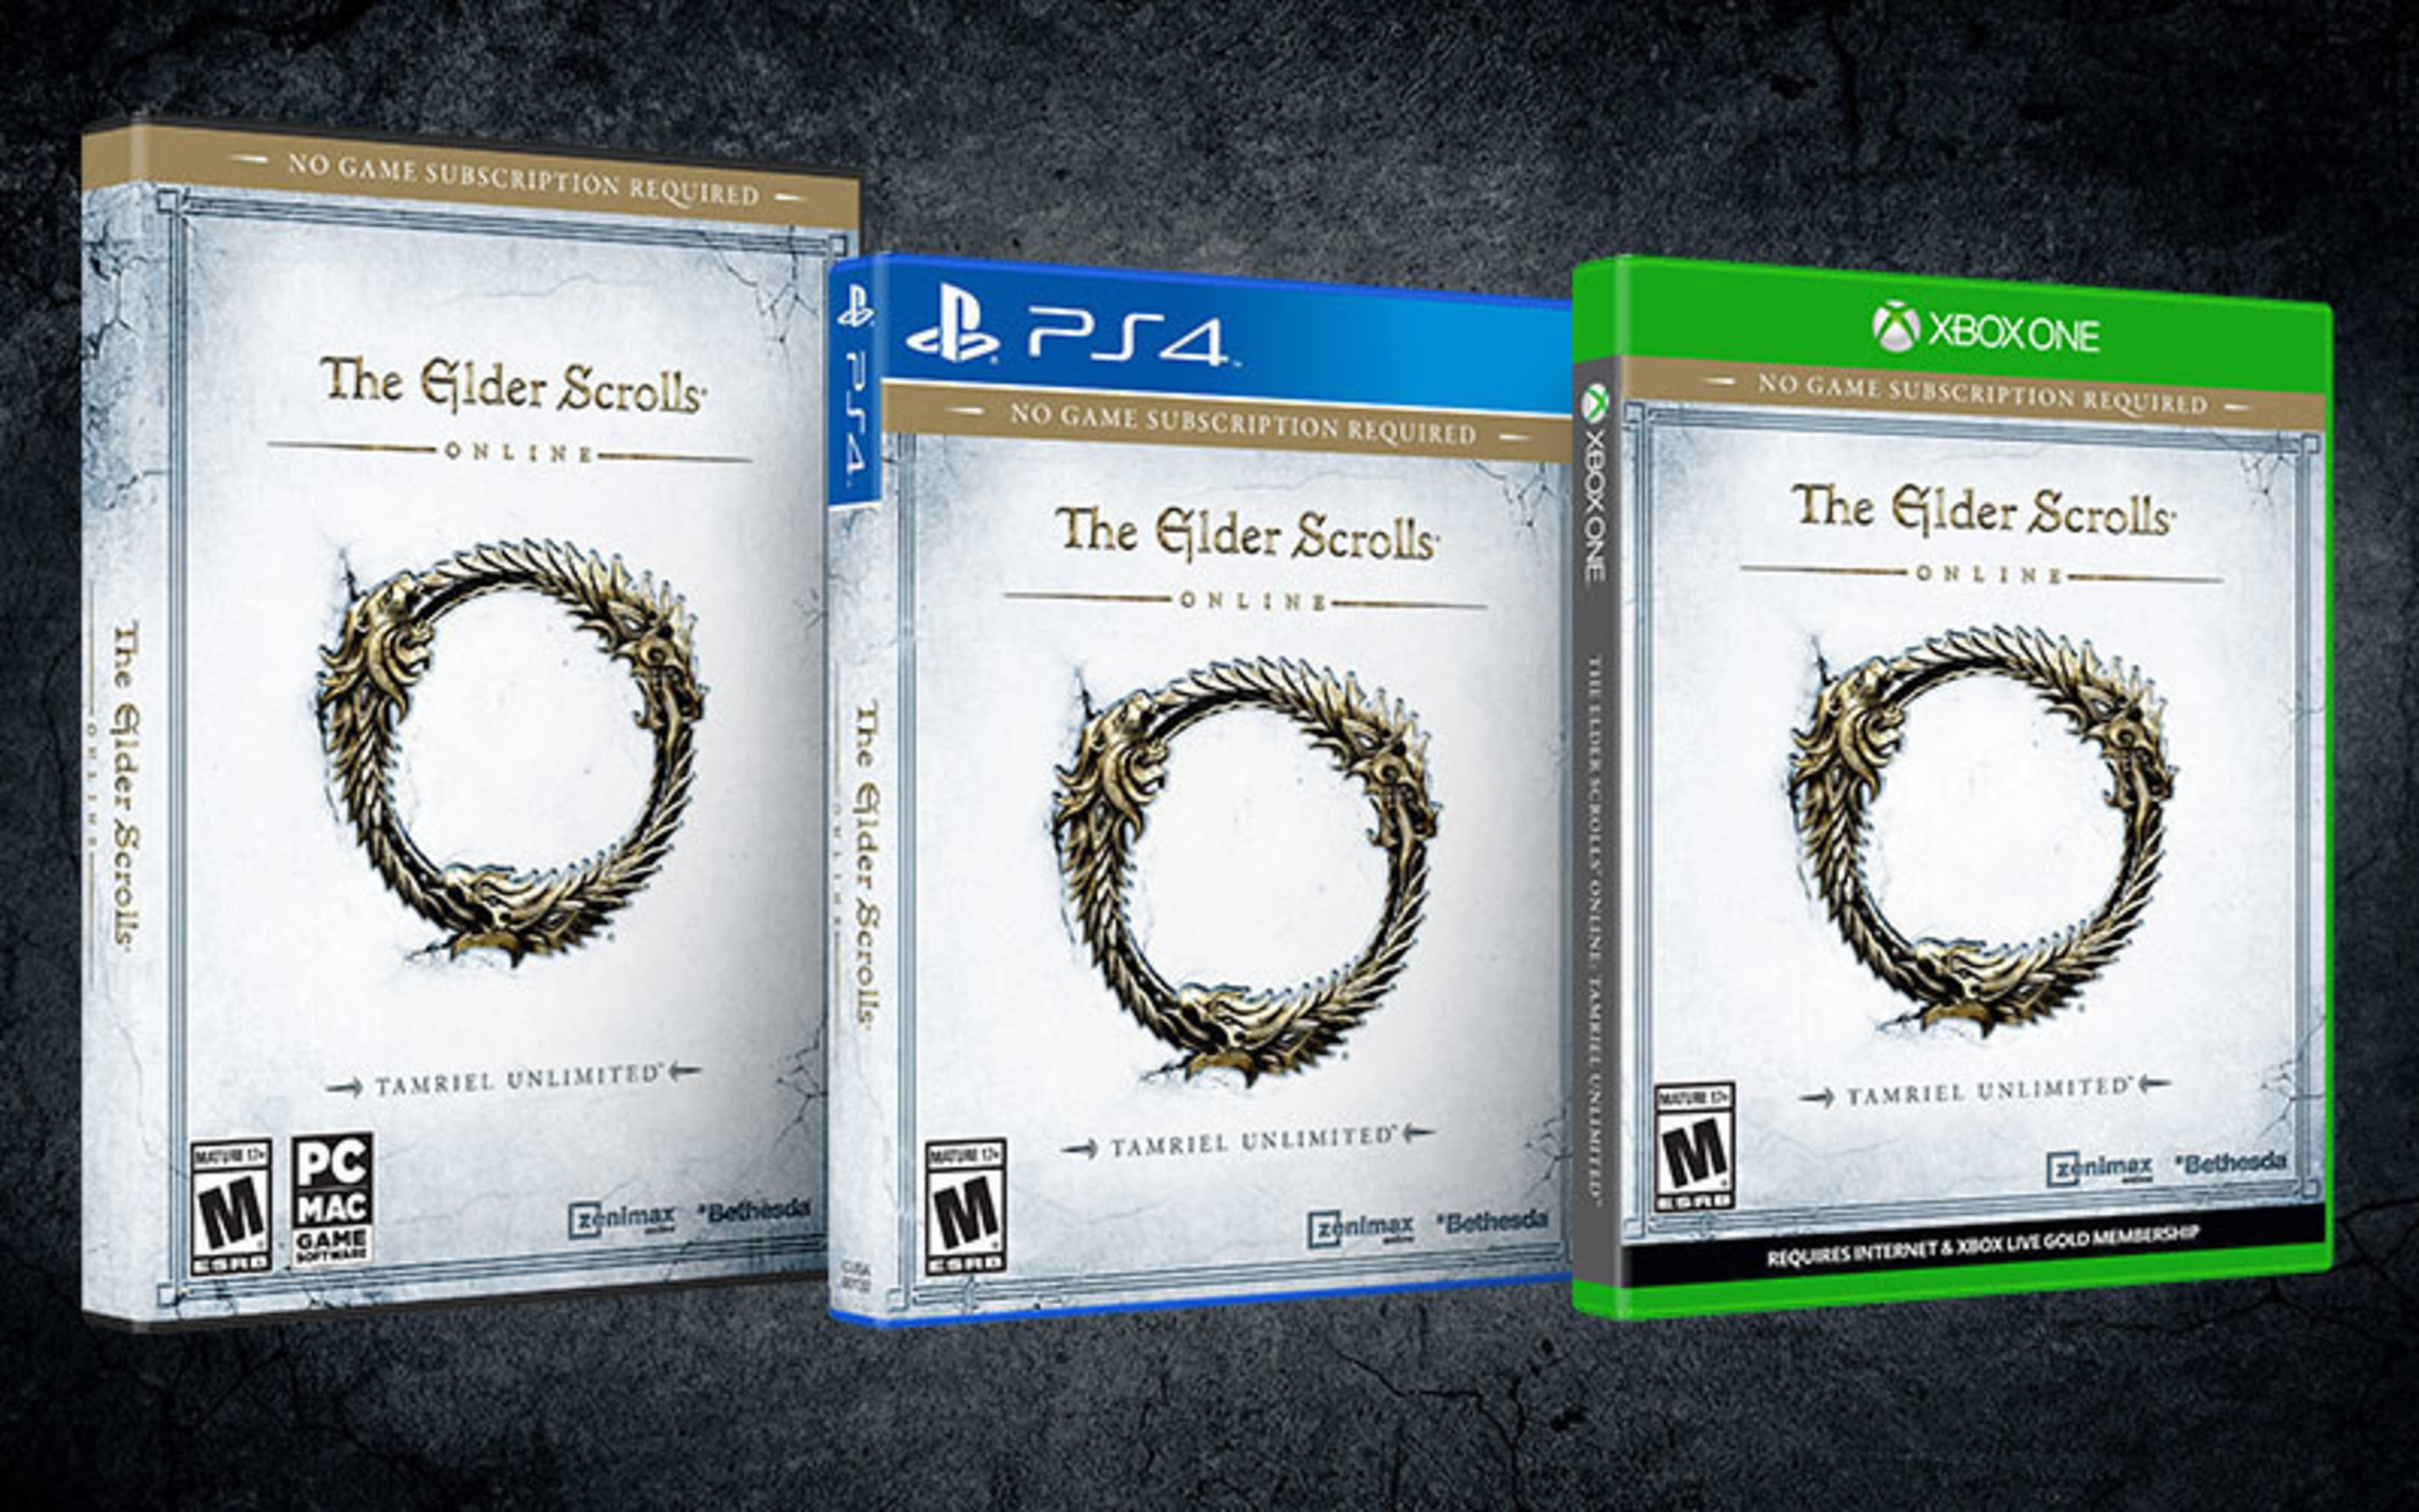 Bethesda Softworks Announces The Elder Scrolls Online®: Tamriel